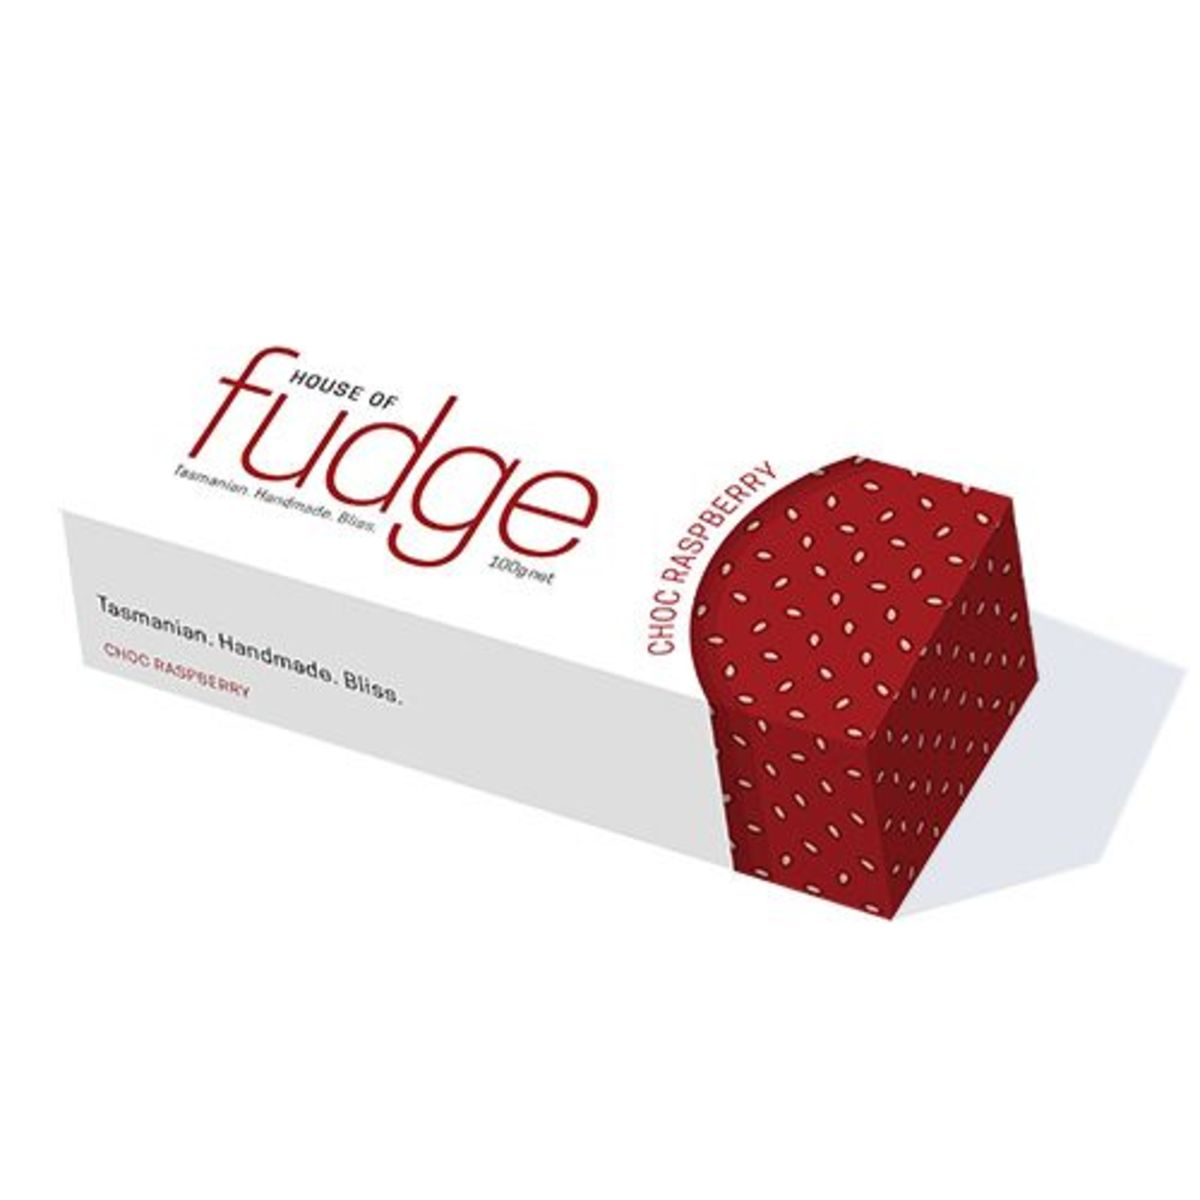 House of Fudge - Chocolate Raspberry